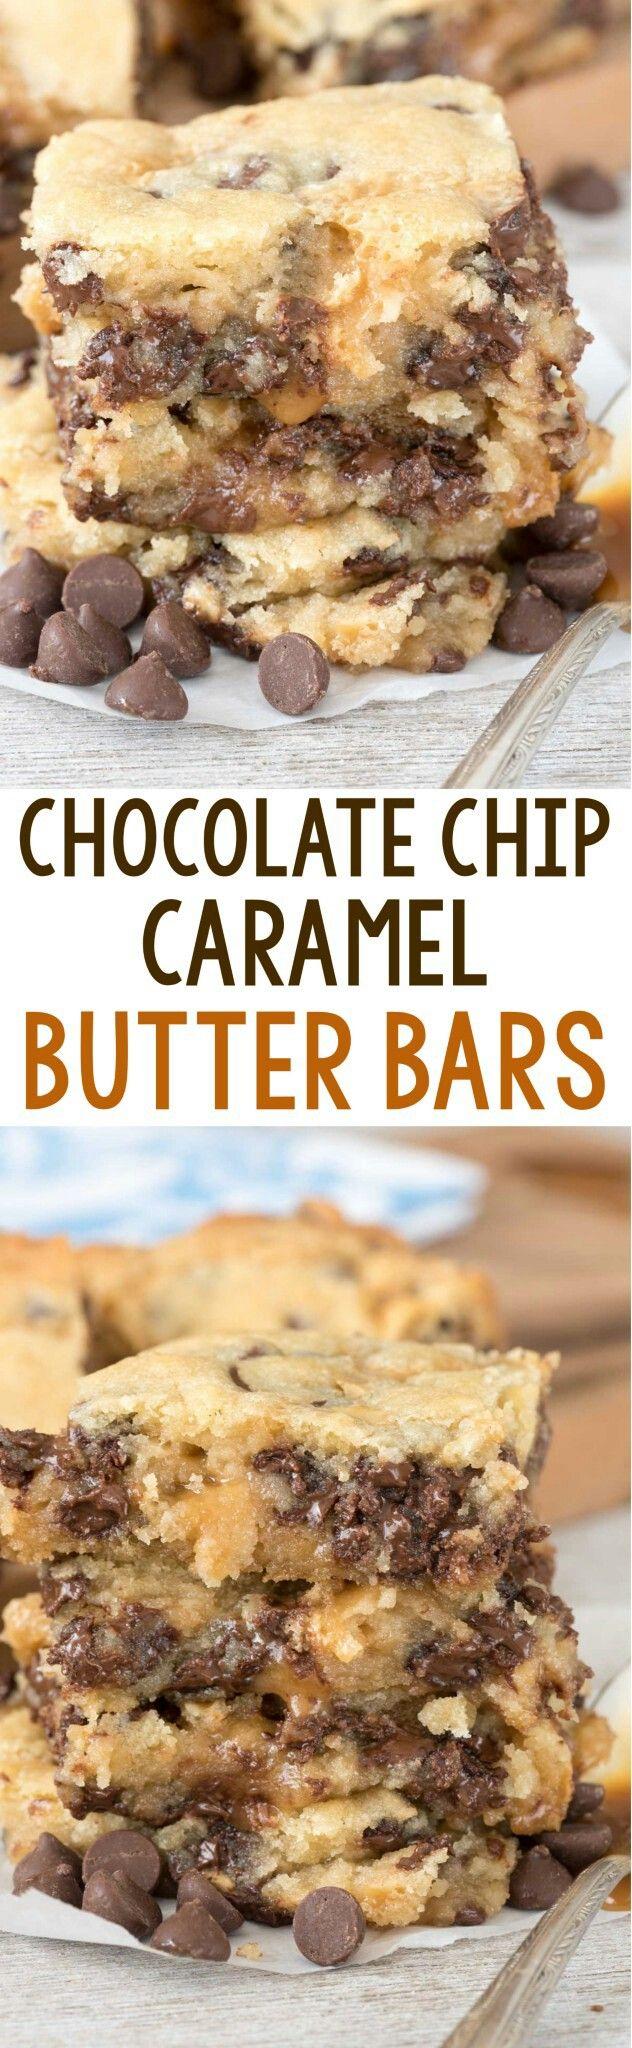 Chocolate Chip Caramel Butter Bars